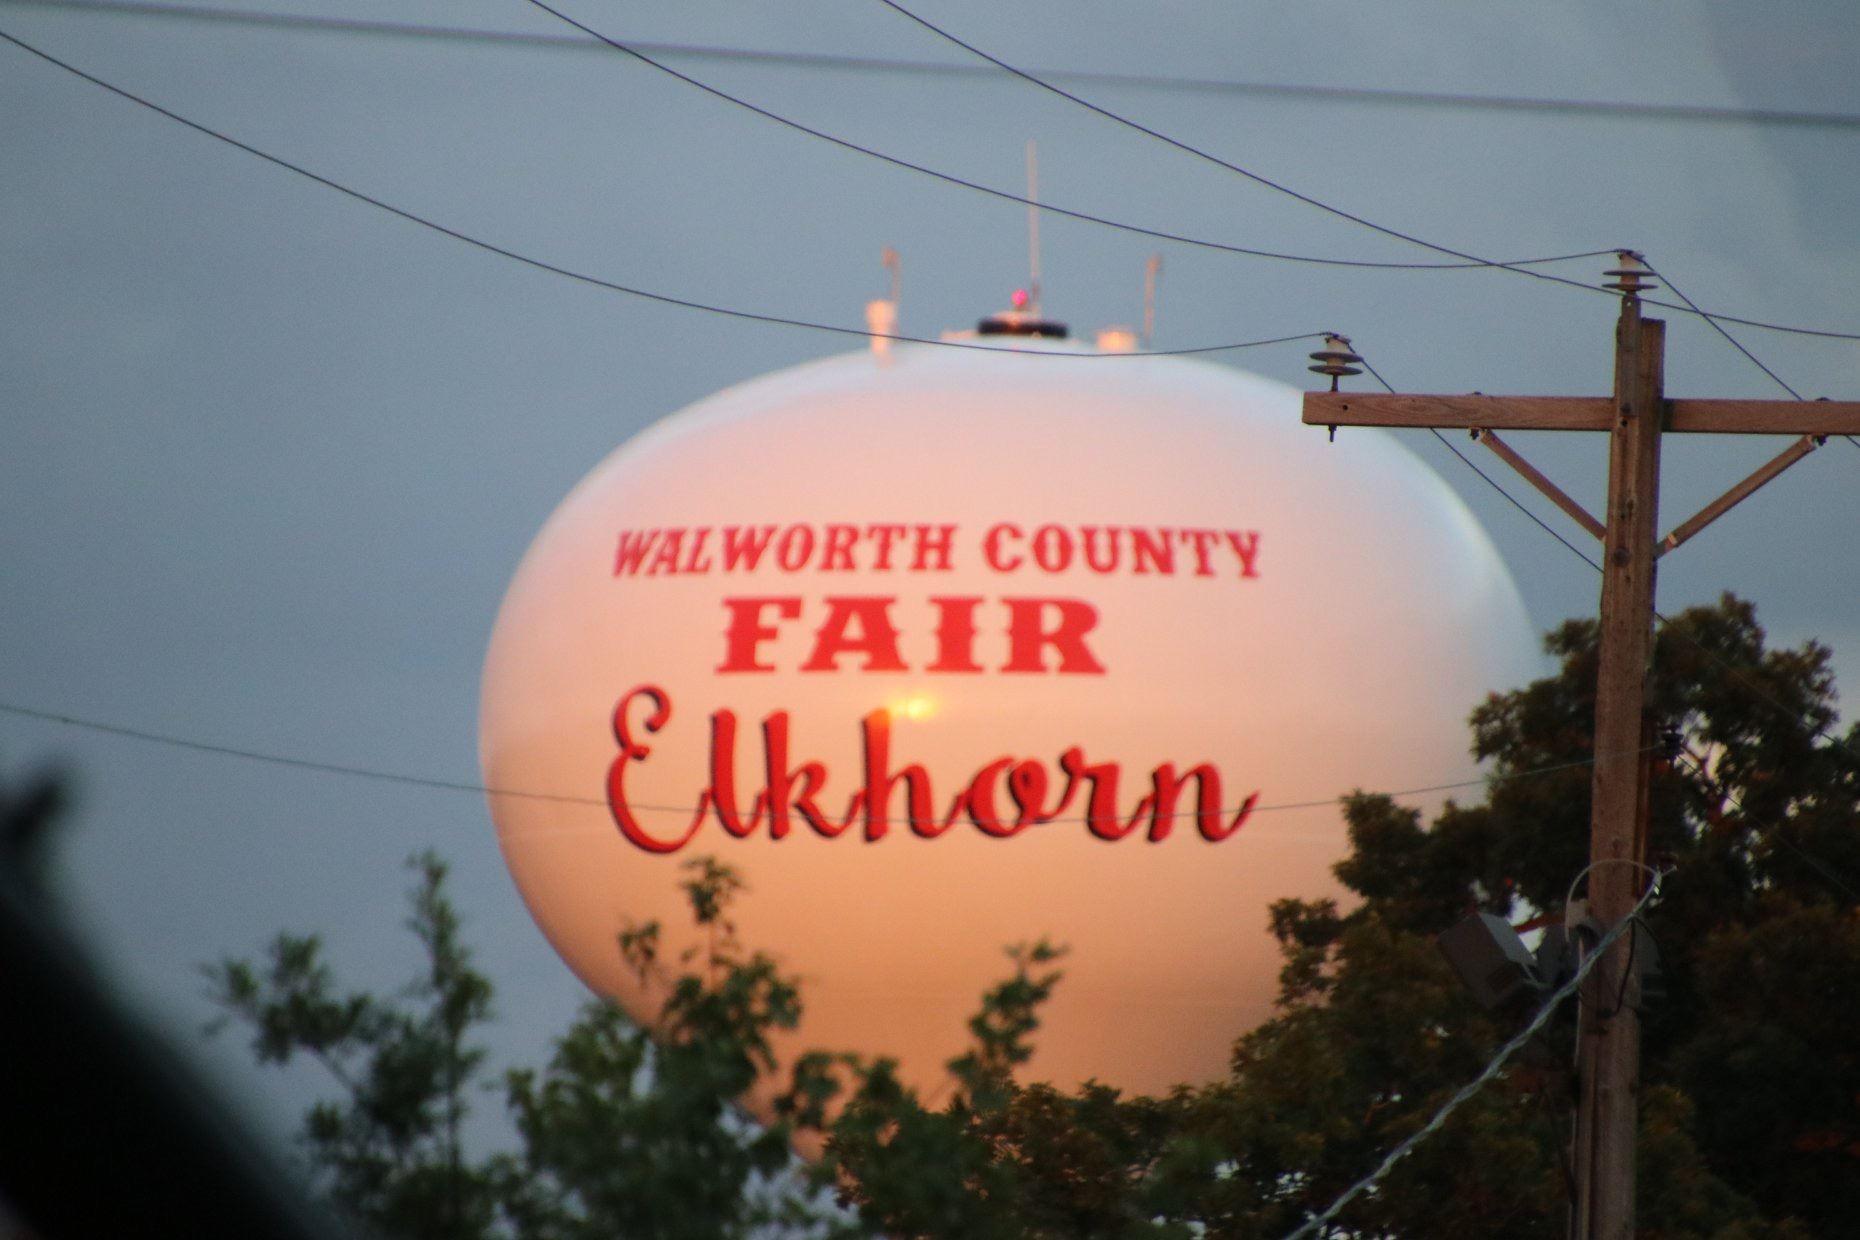 Walworth County Fair 2020.Walworth County Fair Elkhorn